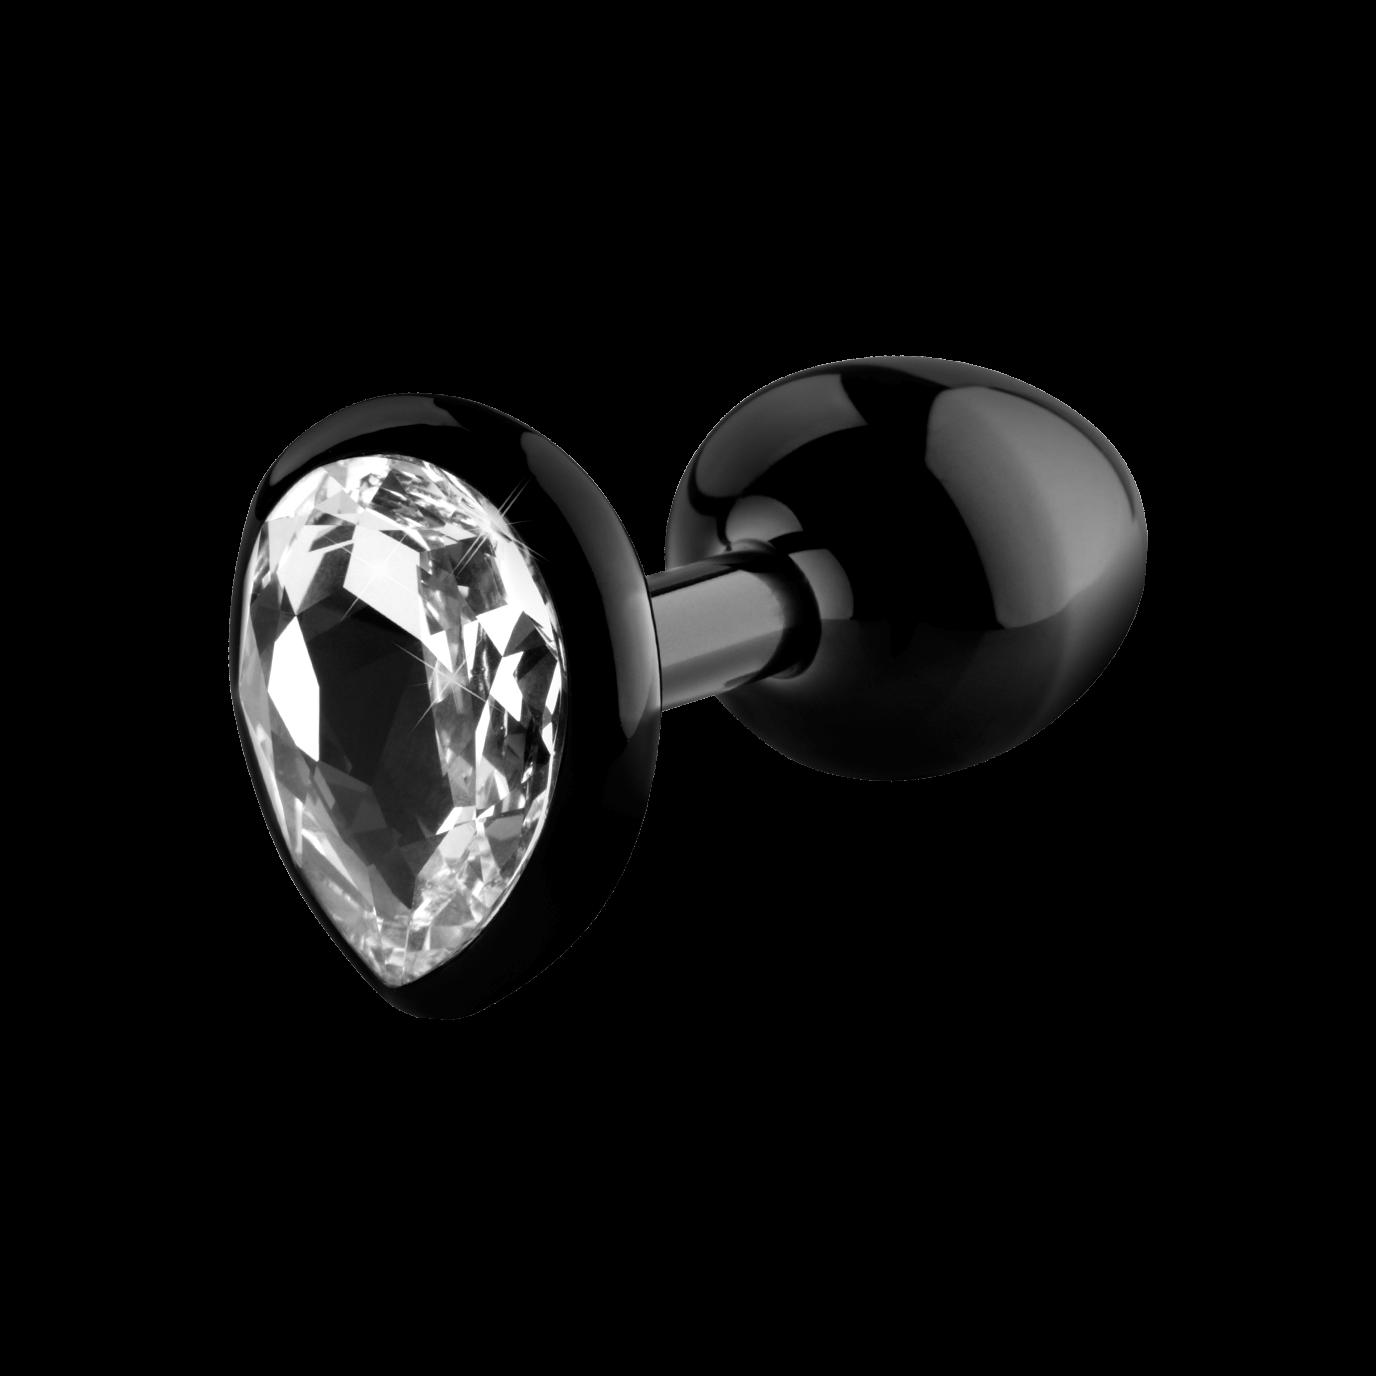 vibrator reinigen jewel anal plug